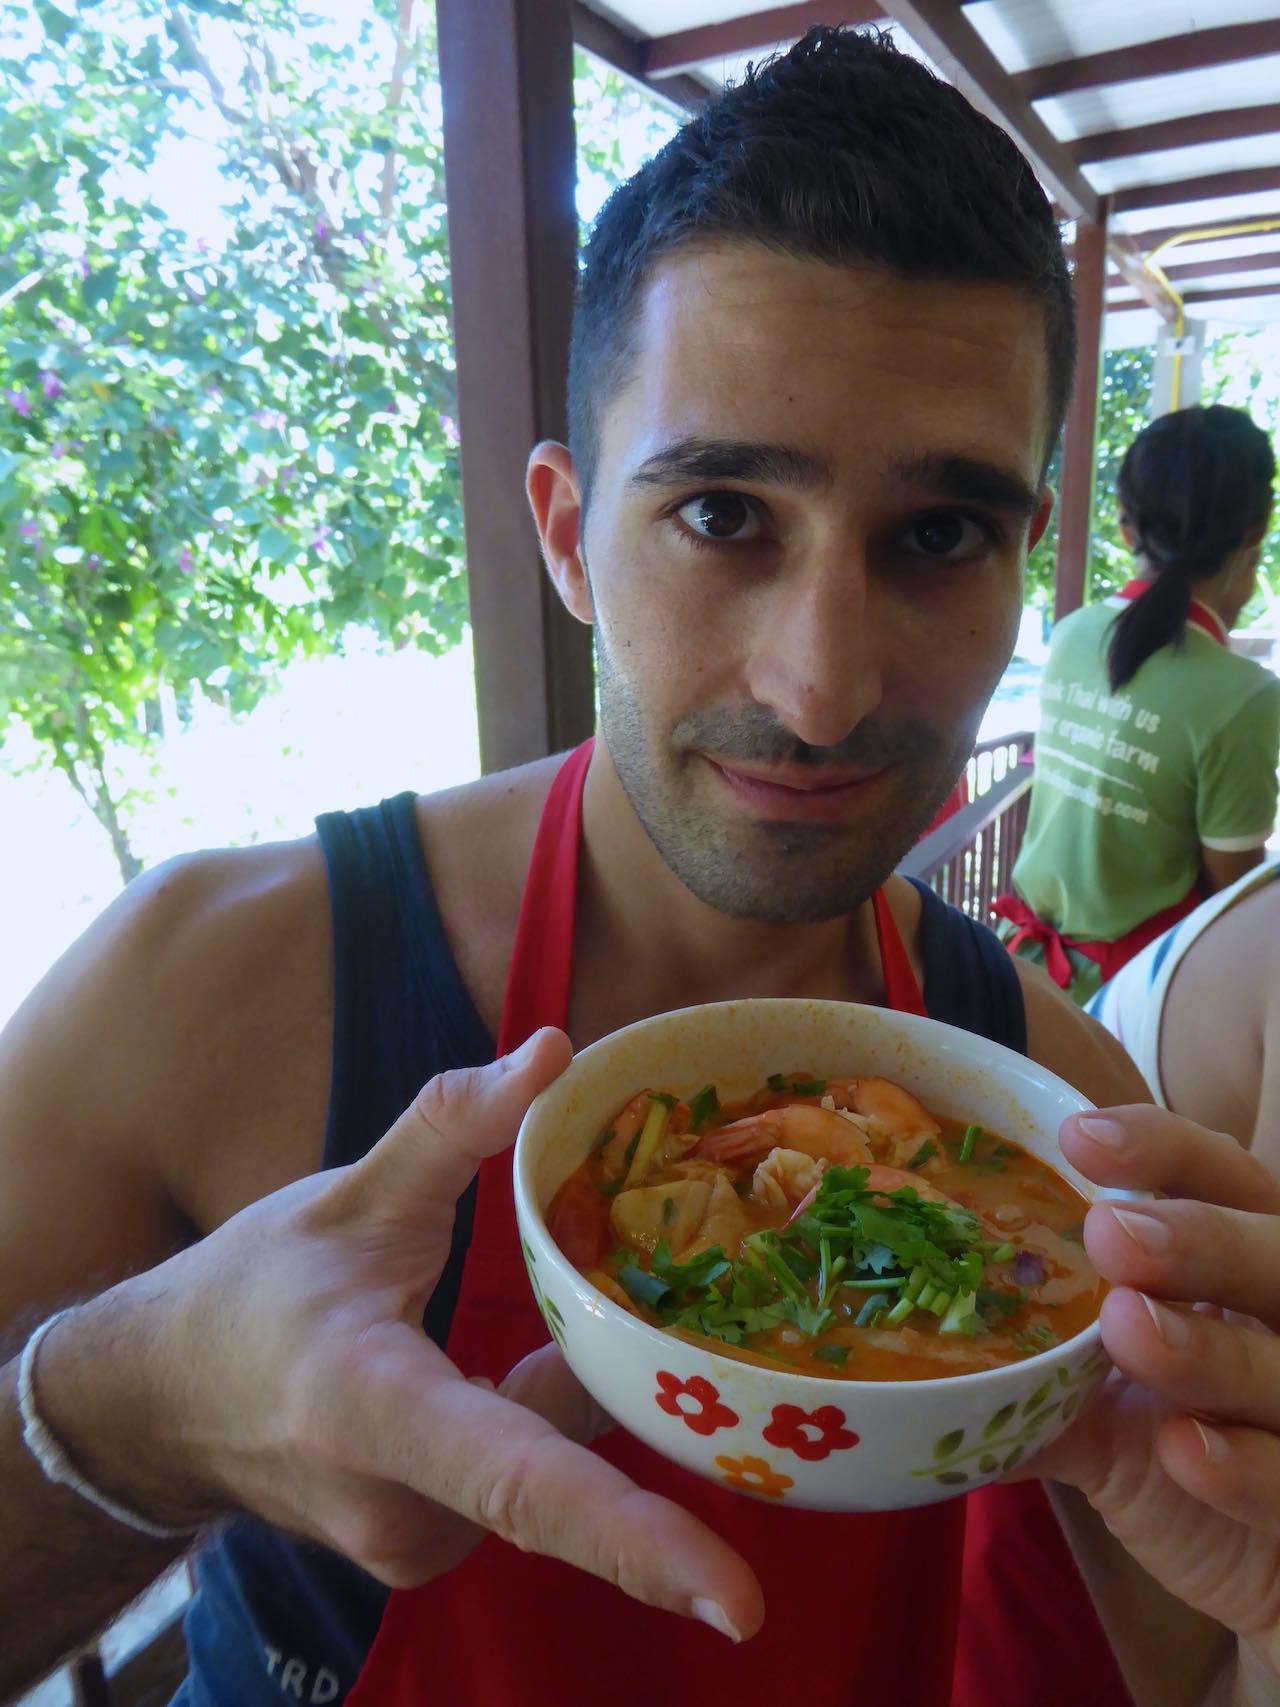 Thai Street Food Tom Yam Goong soup